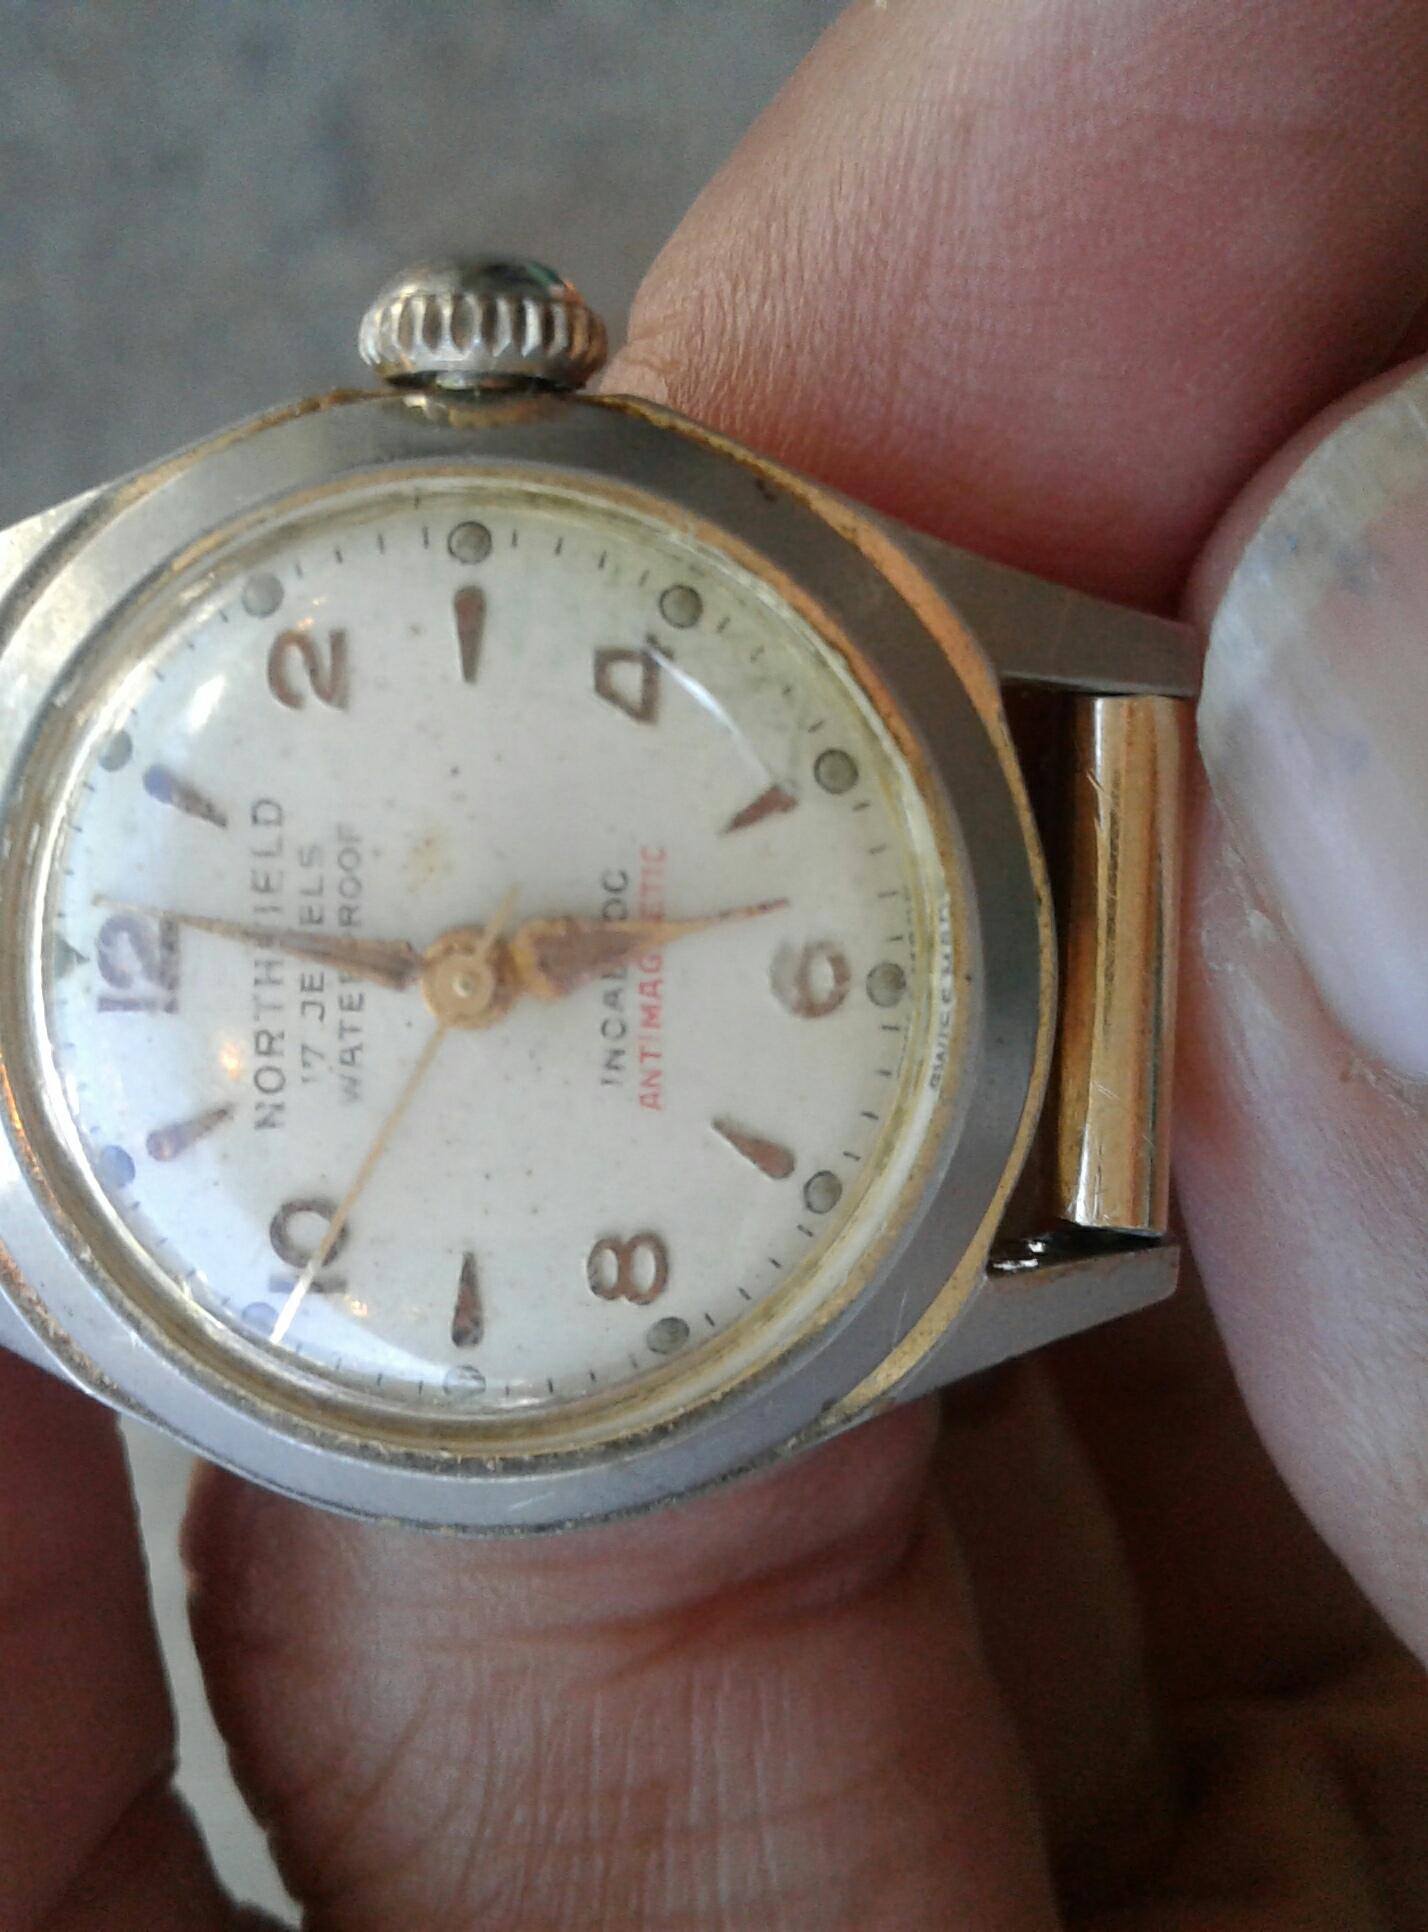 Northfield 17 jewels waterproof incabloc antimagnetic swiss made watch